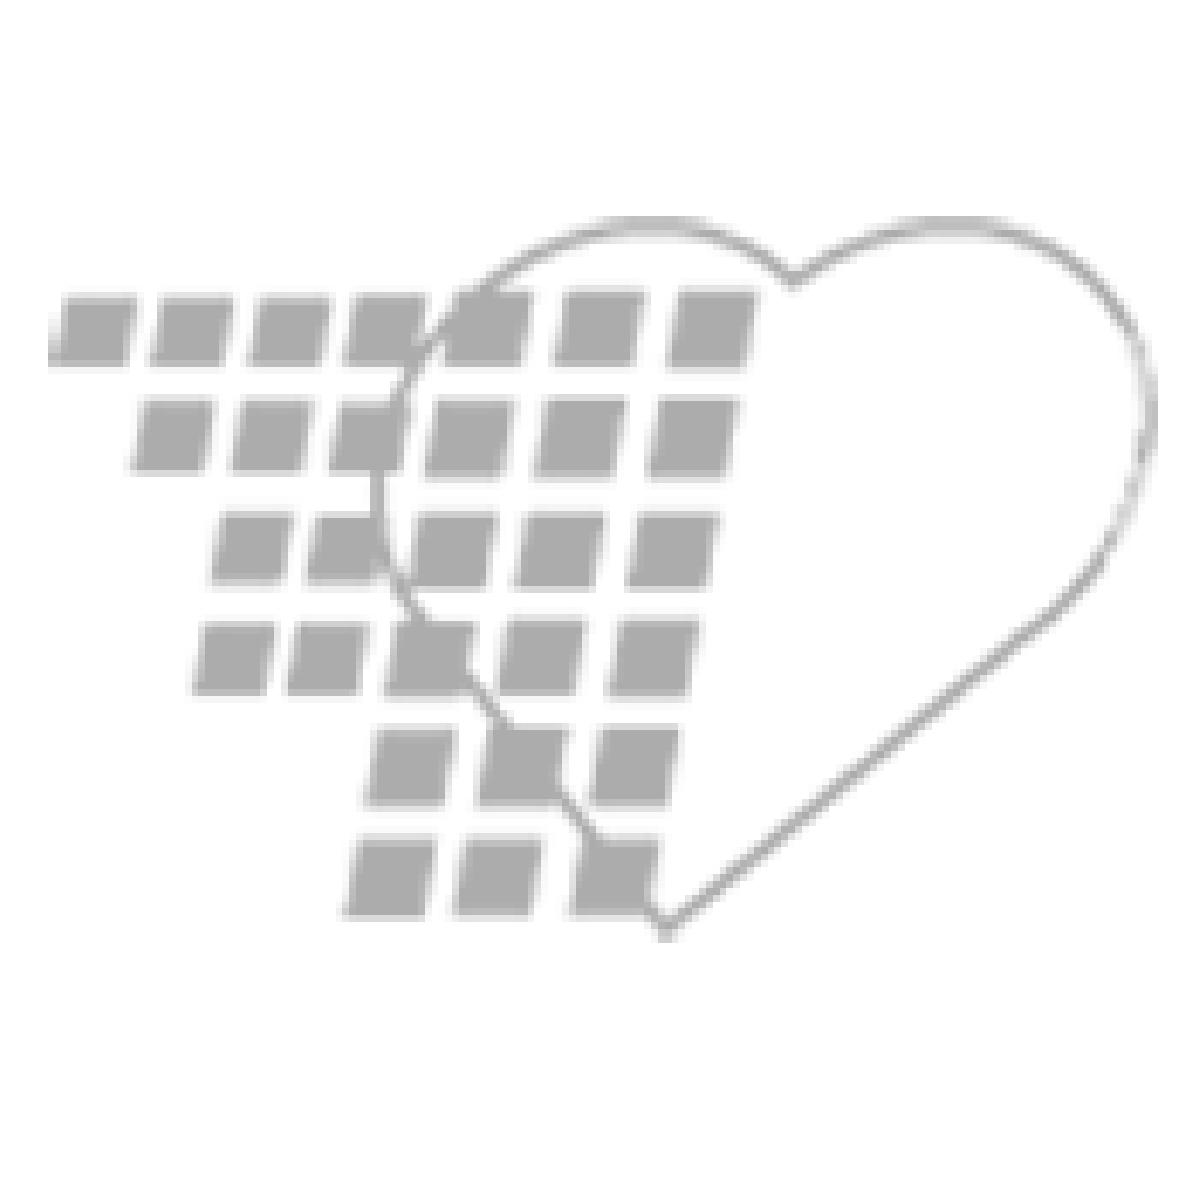 11-81-6061 Peter PICC Line™